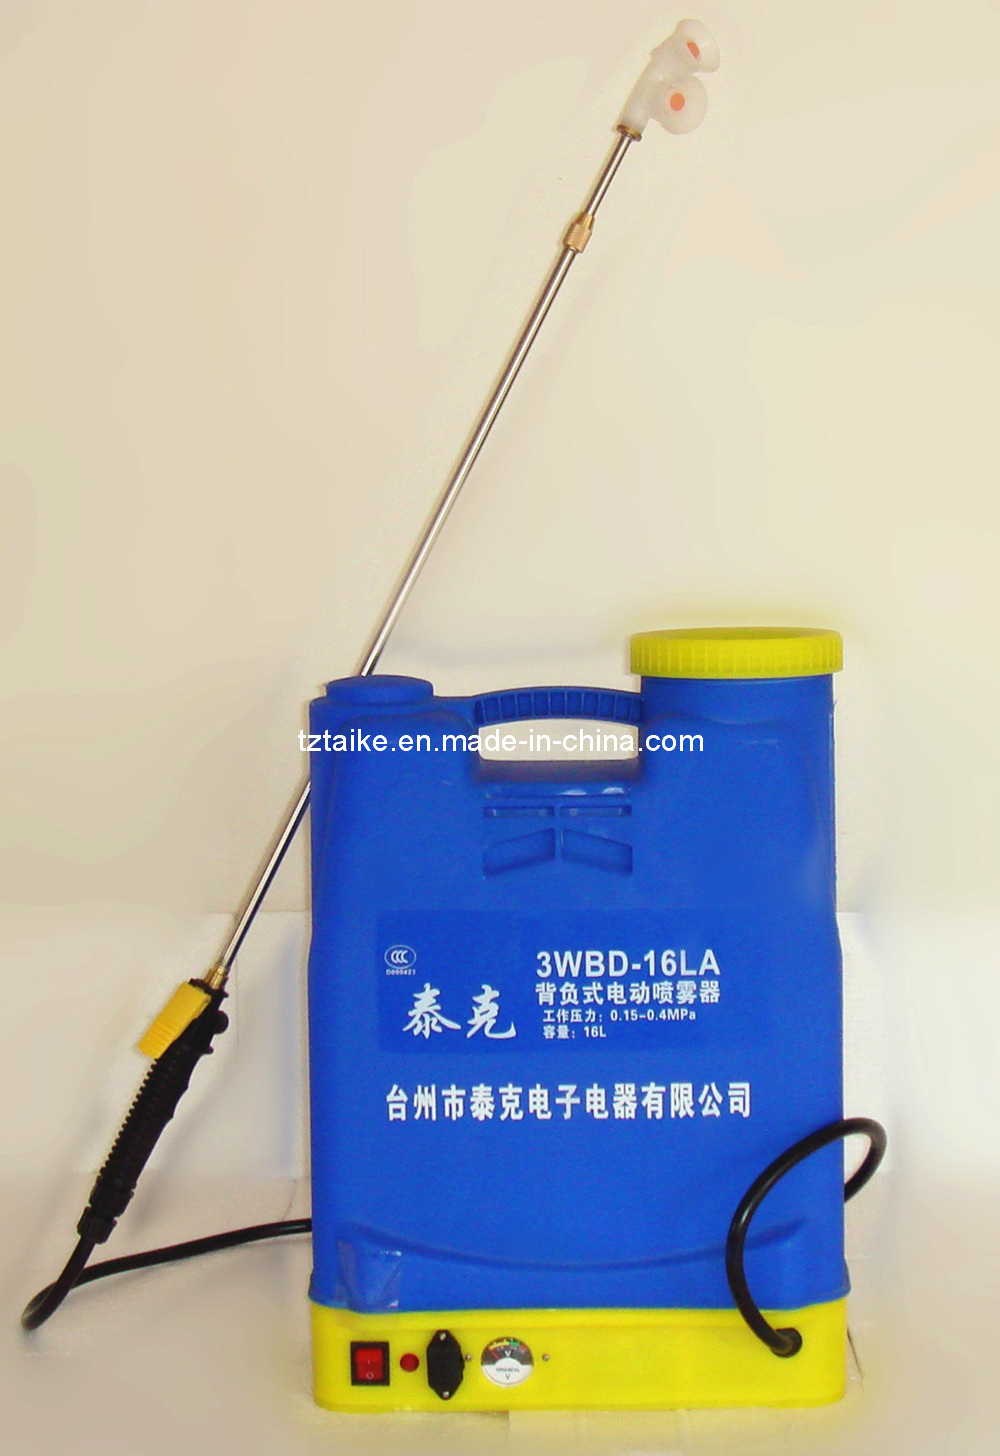 Giardino sprayers battery sprayer 3wbd 16la dello zaino for Spruzzatori giardino